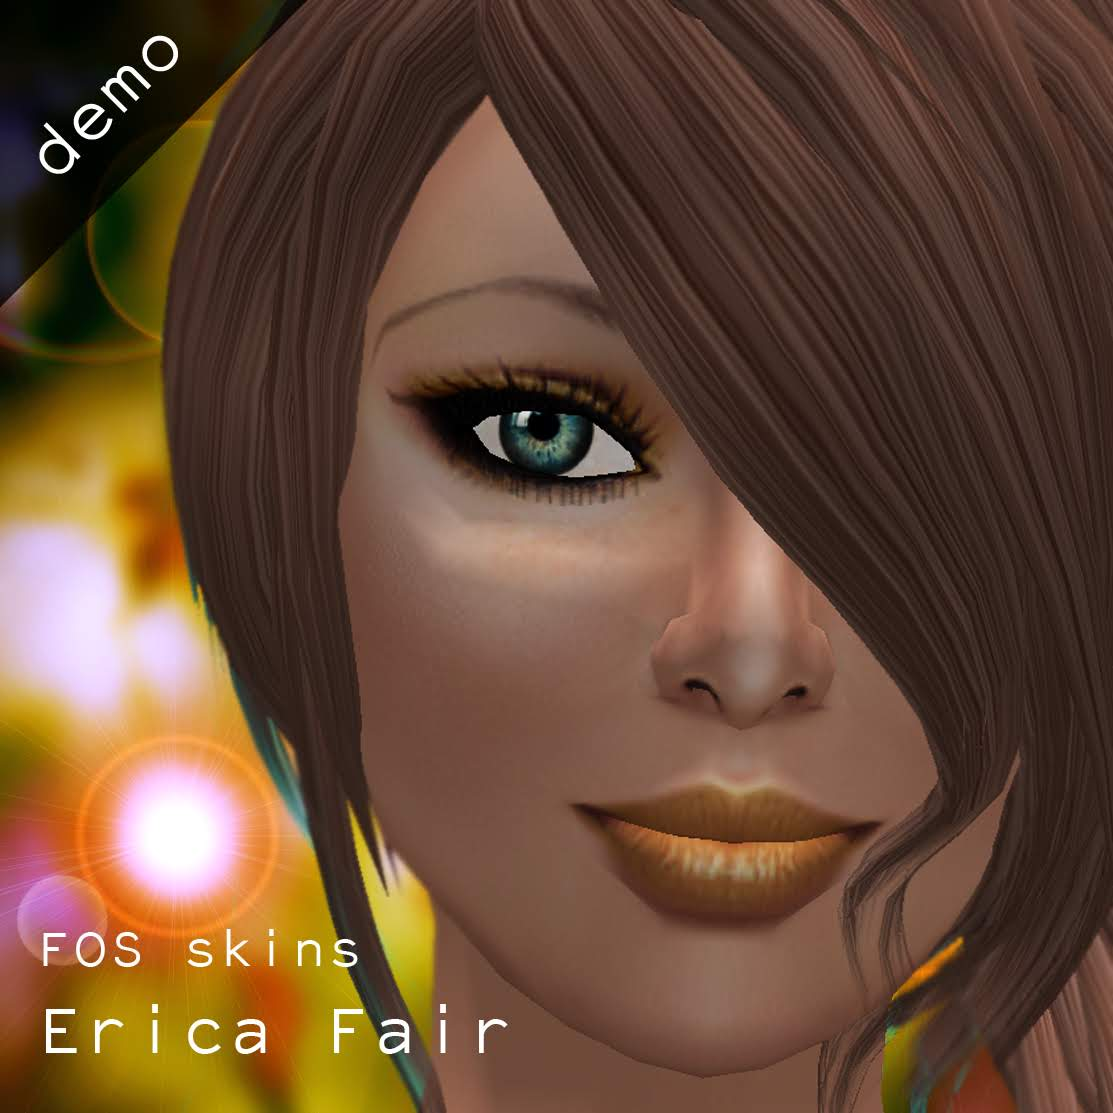 Erica fair